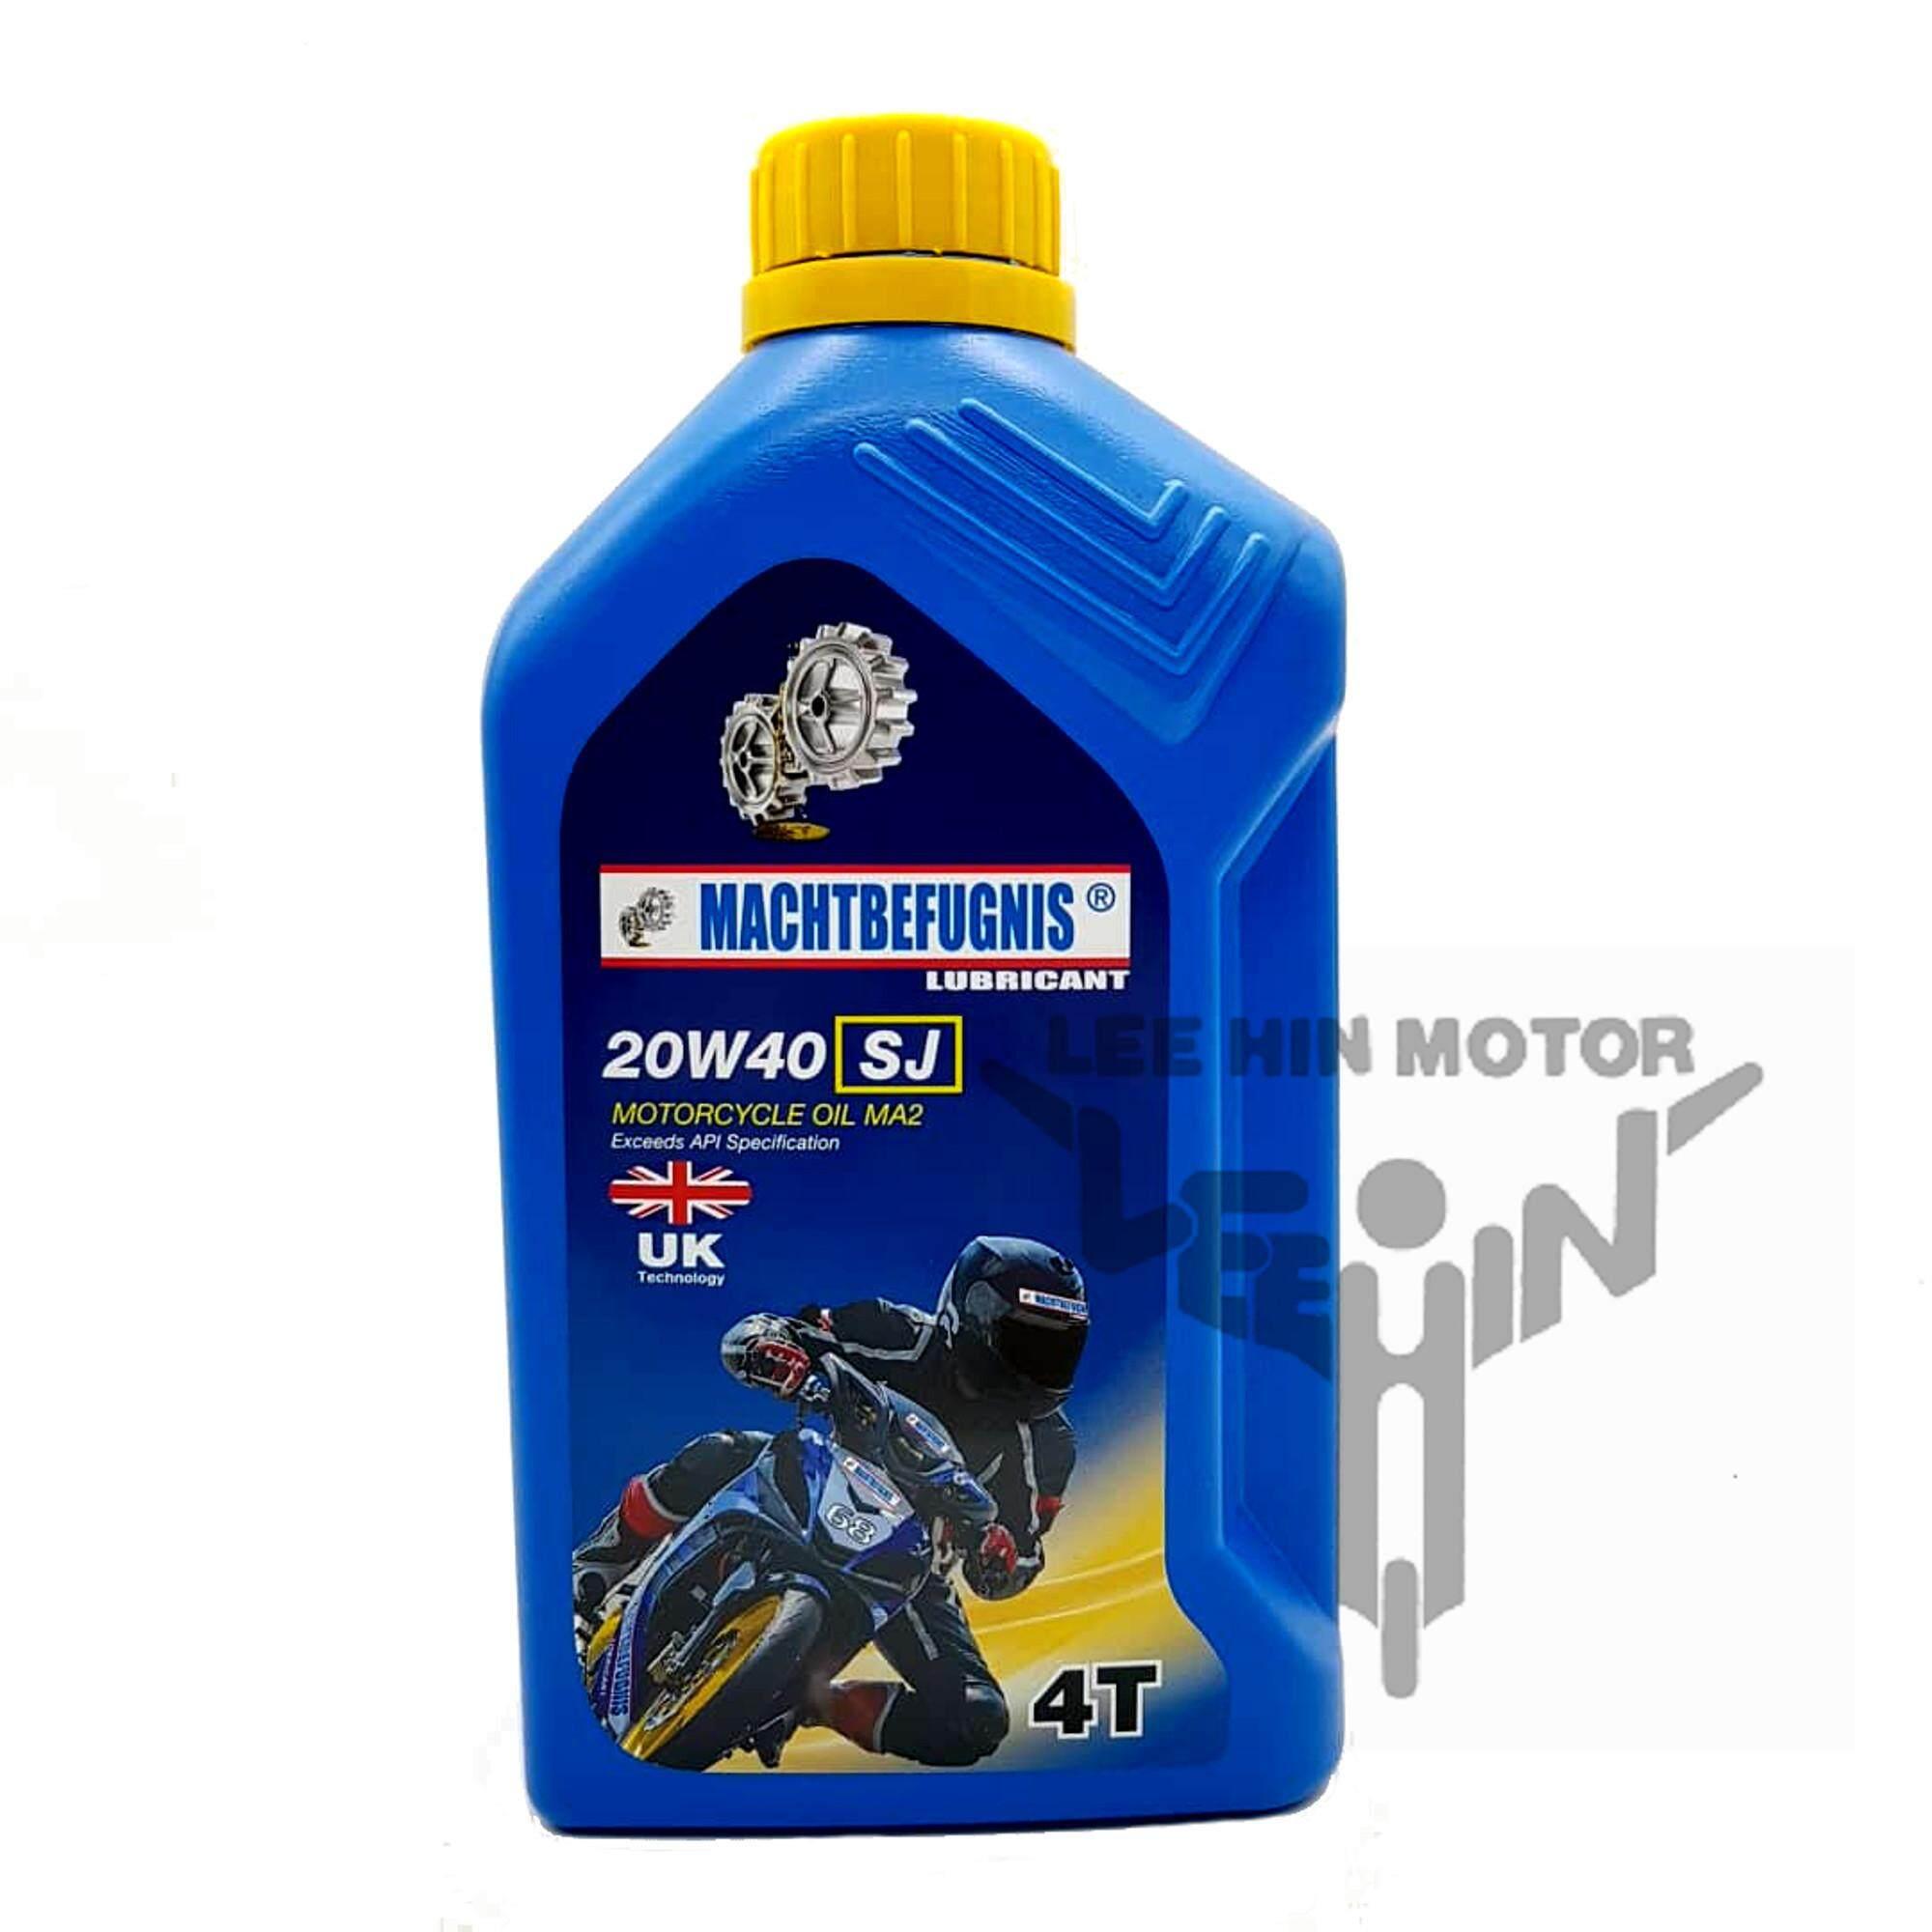 Machtbefugnis 20w40 4T Engine Oil Minyak Hitam ( 1 Litre )